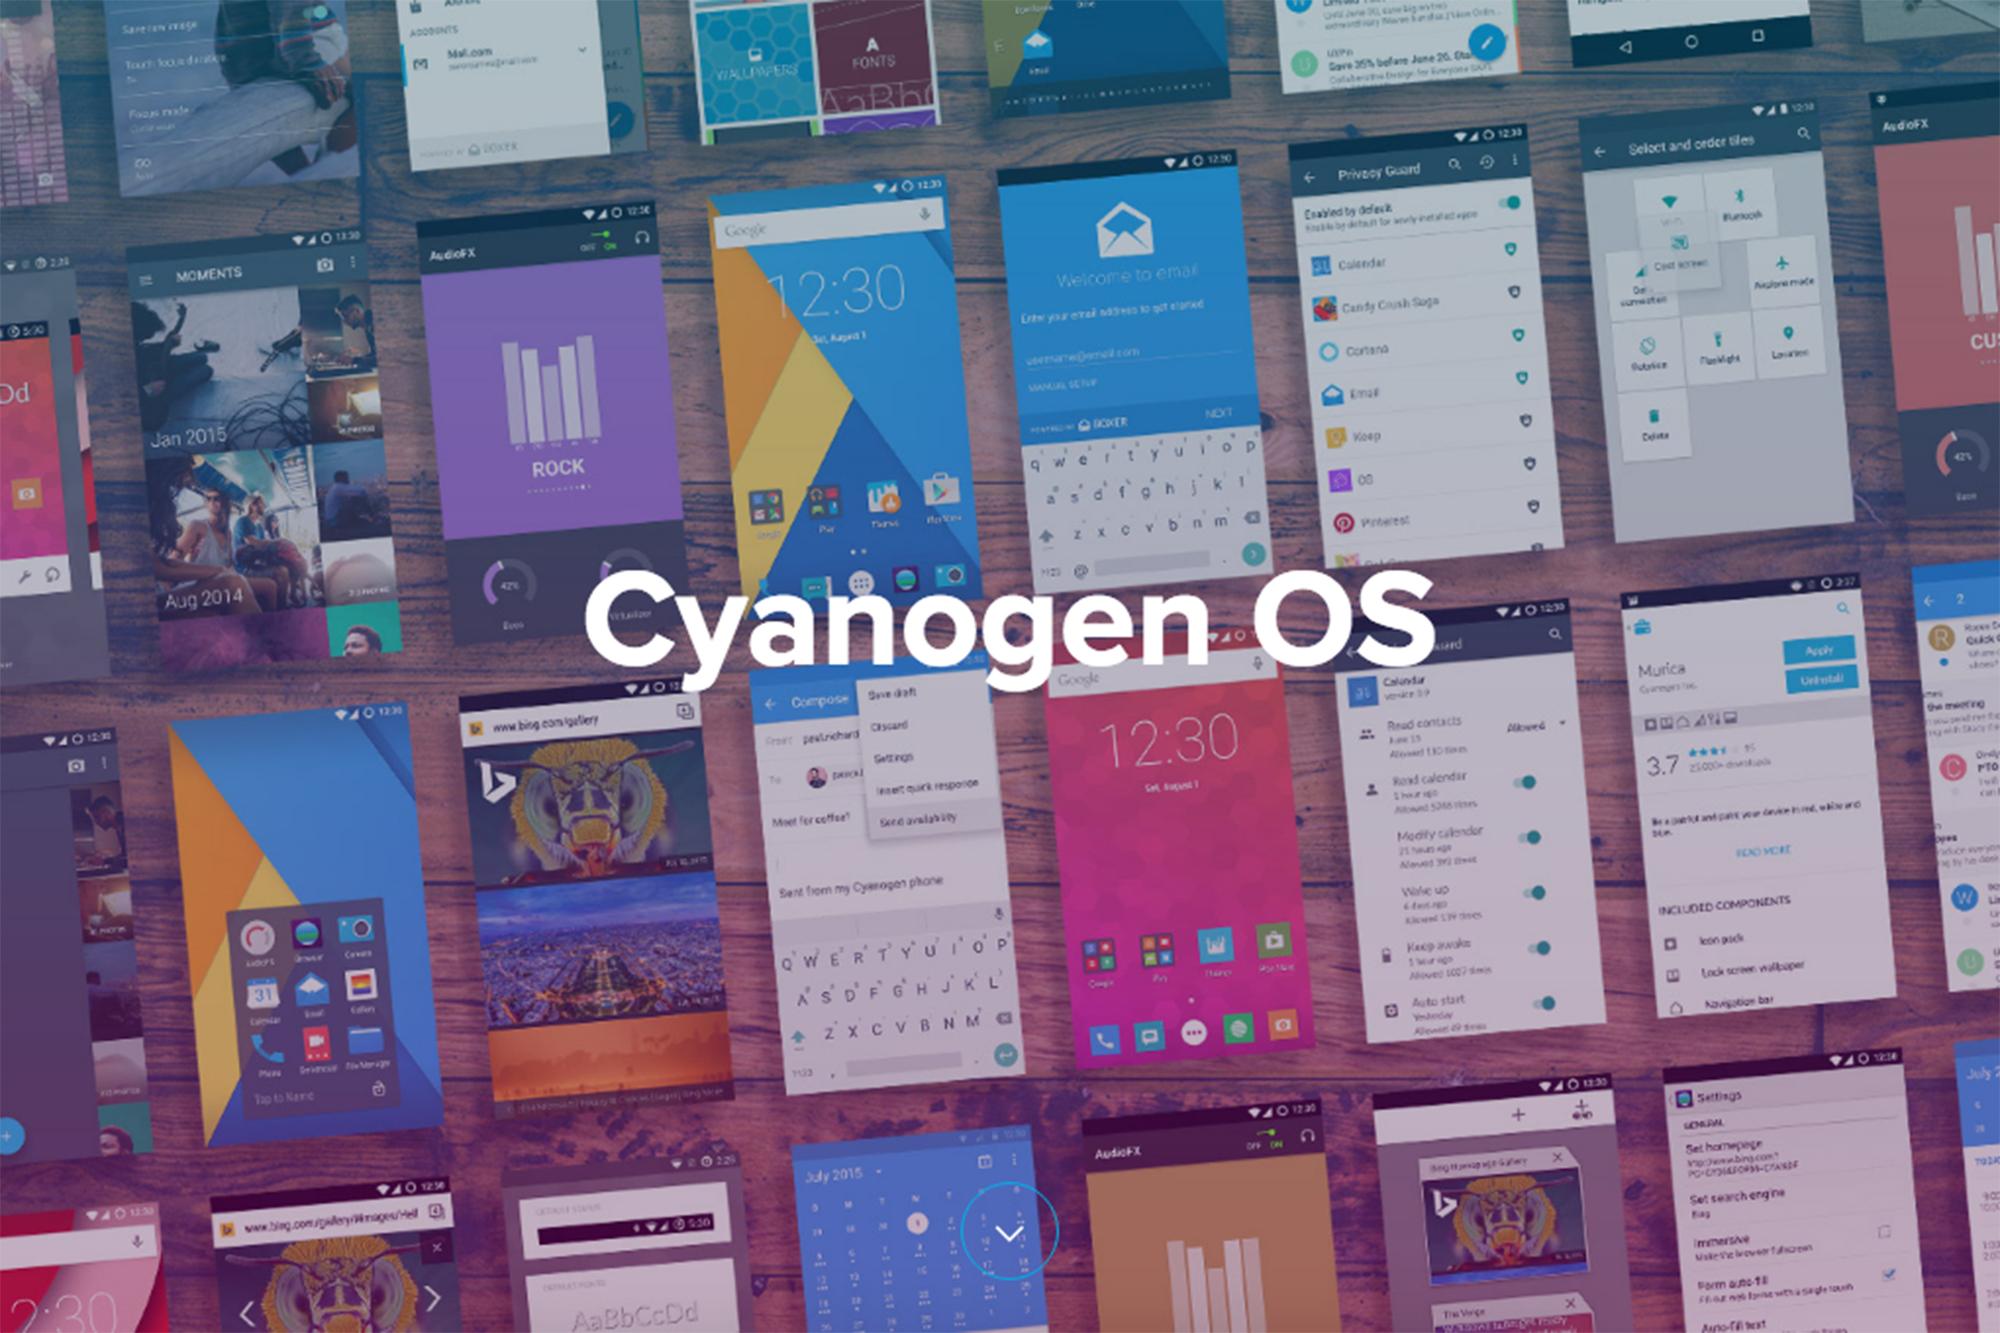 Cyanogne